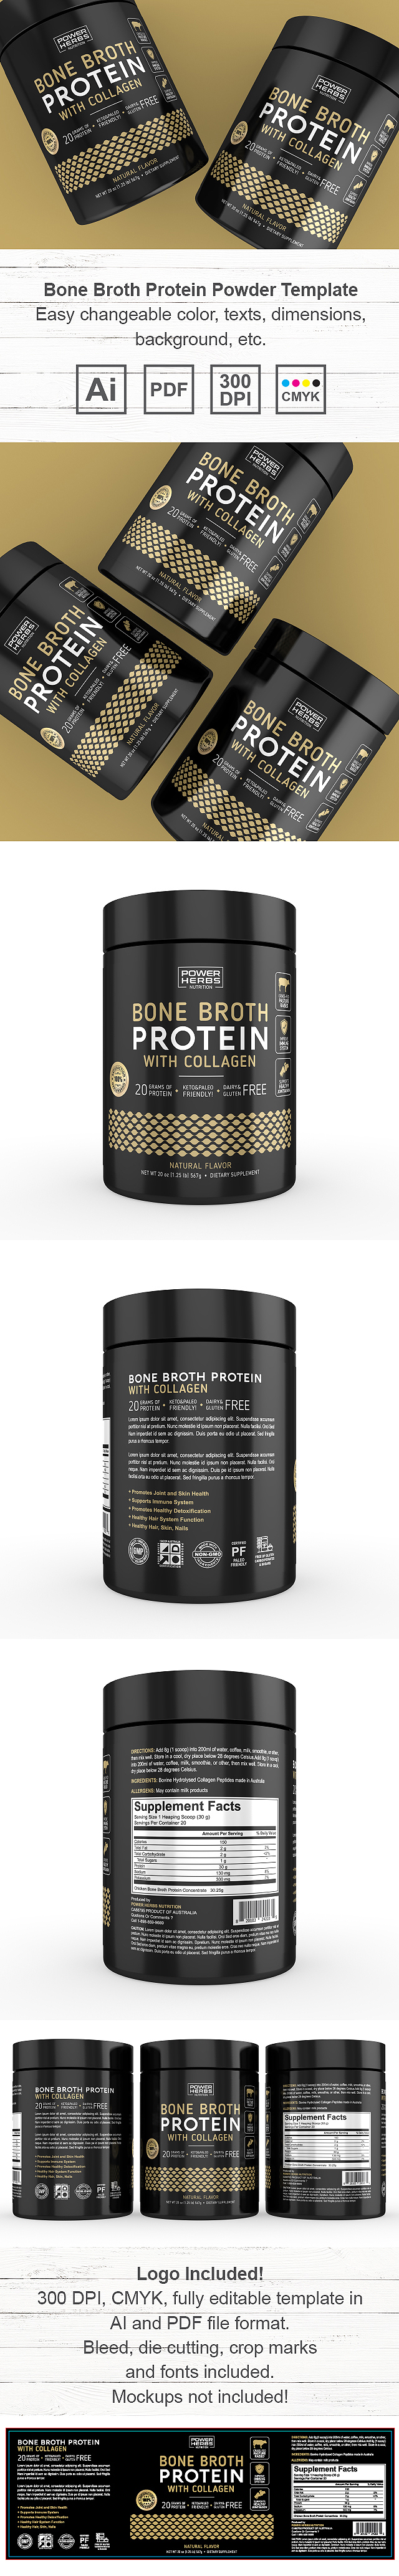 Bone Broth Protein Powder Label Template